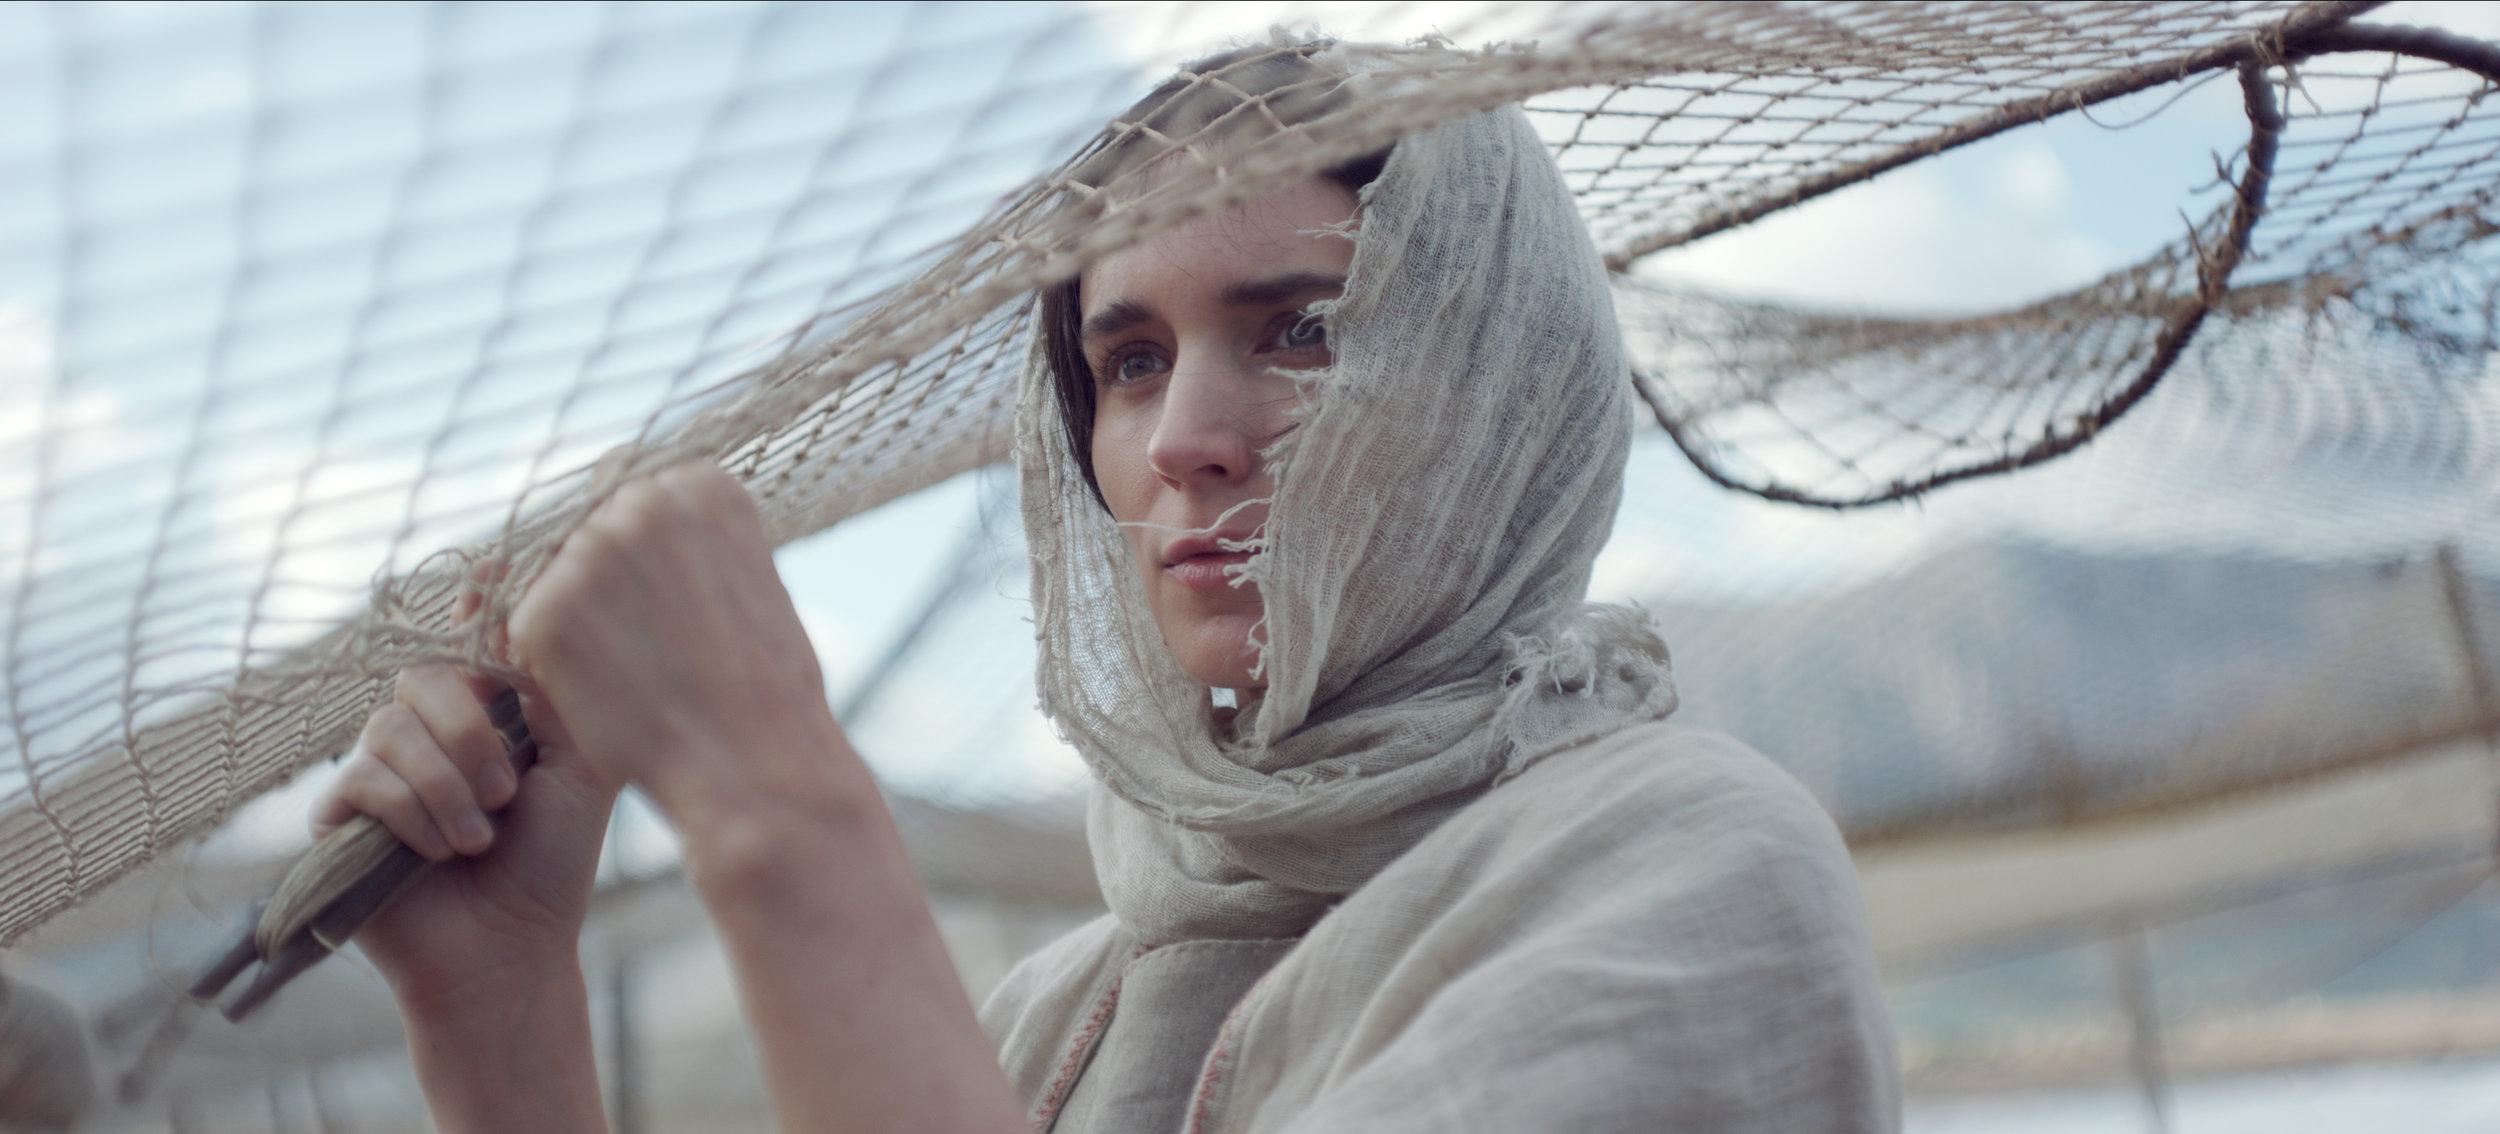 "Rooney Mara plays Mary of Magdala, who leaves her fishing village to follow Jesus (Joaquin Phoenix), in the biblical drama ""Mary Magdalene."" (Photo courtesy IFC Films.)"